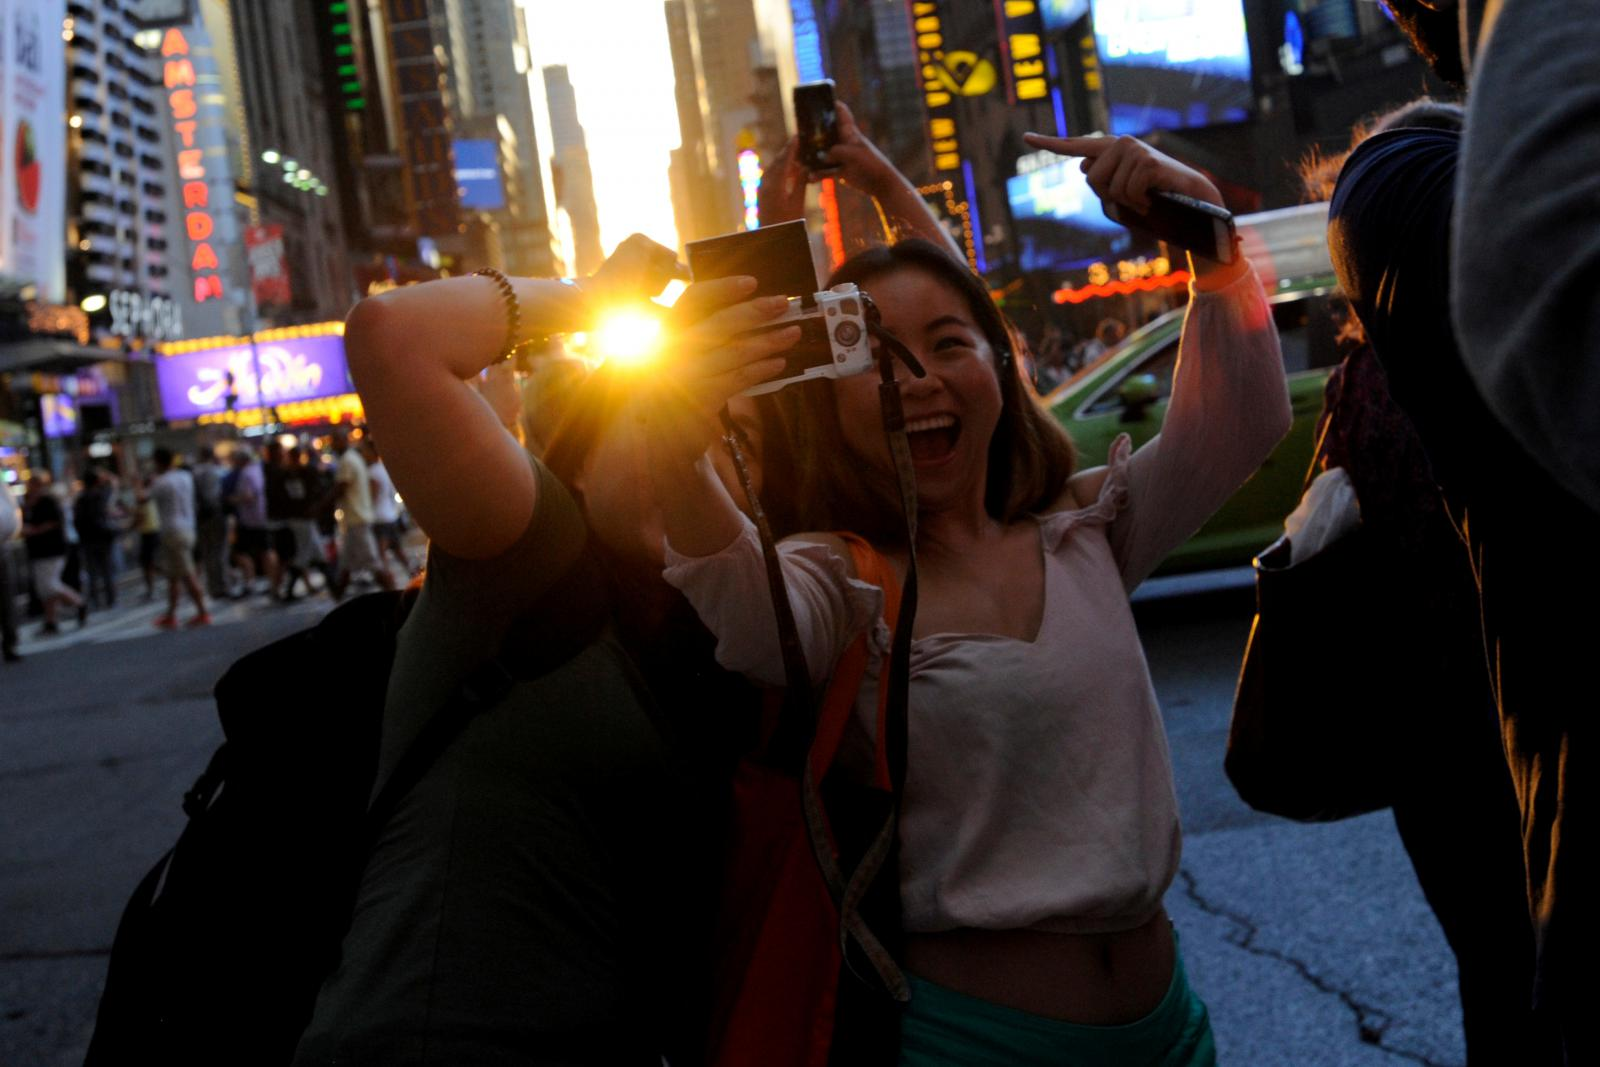 Lidé se fotí během úkazu Manhattanhenge